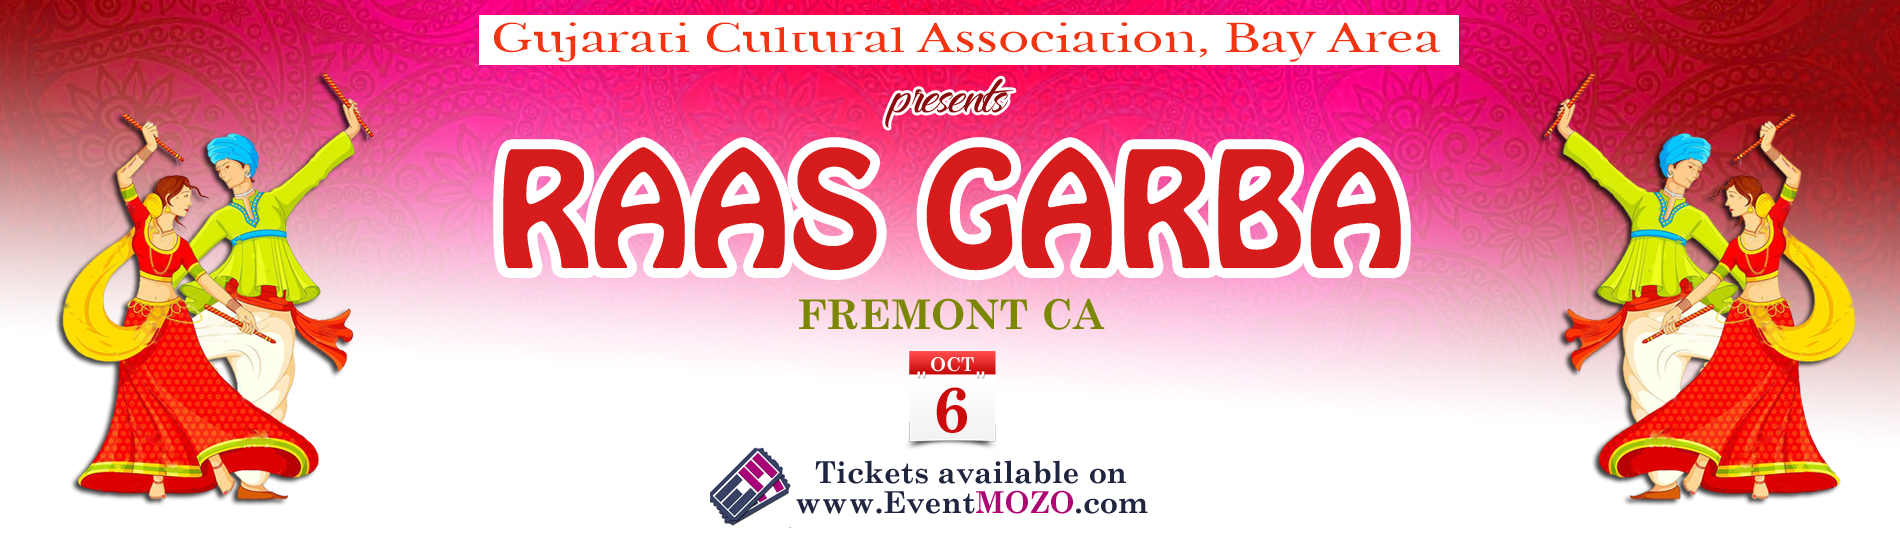 EventMozo GCA Bay Area Raas Garba 2018